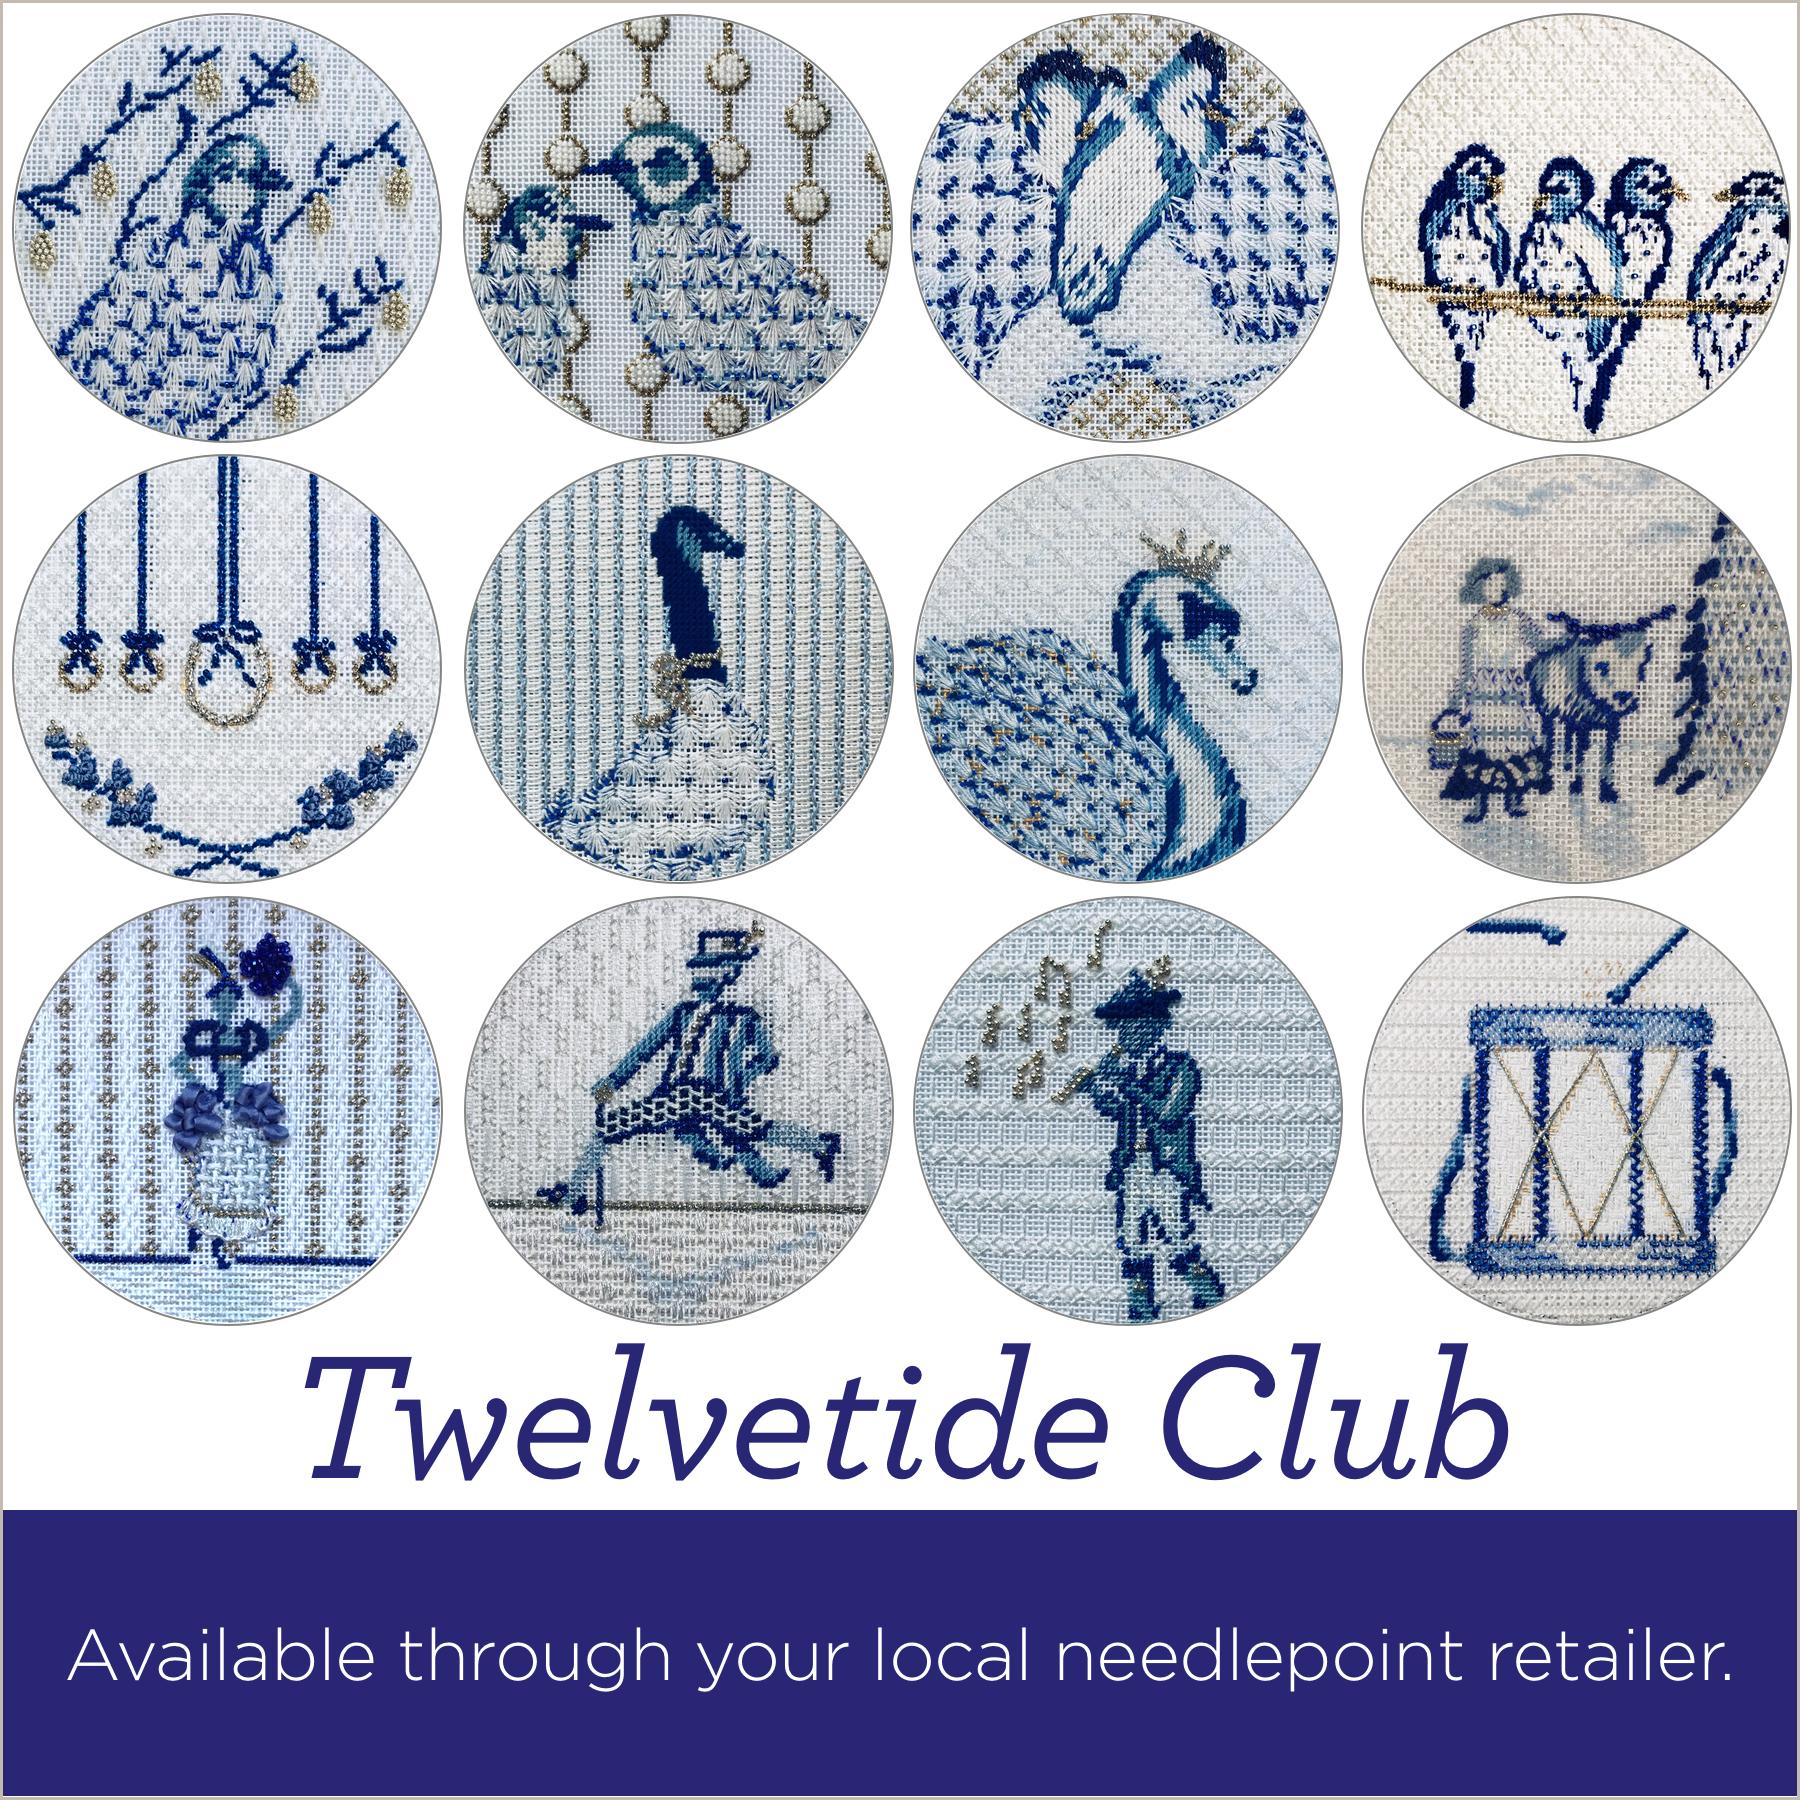 Twelvetide Stitched.jpg